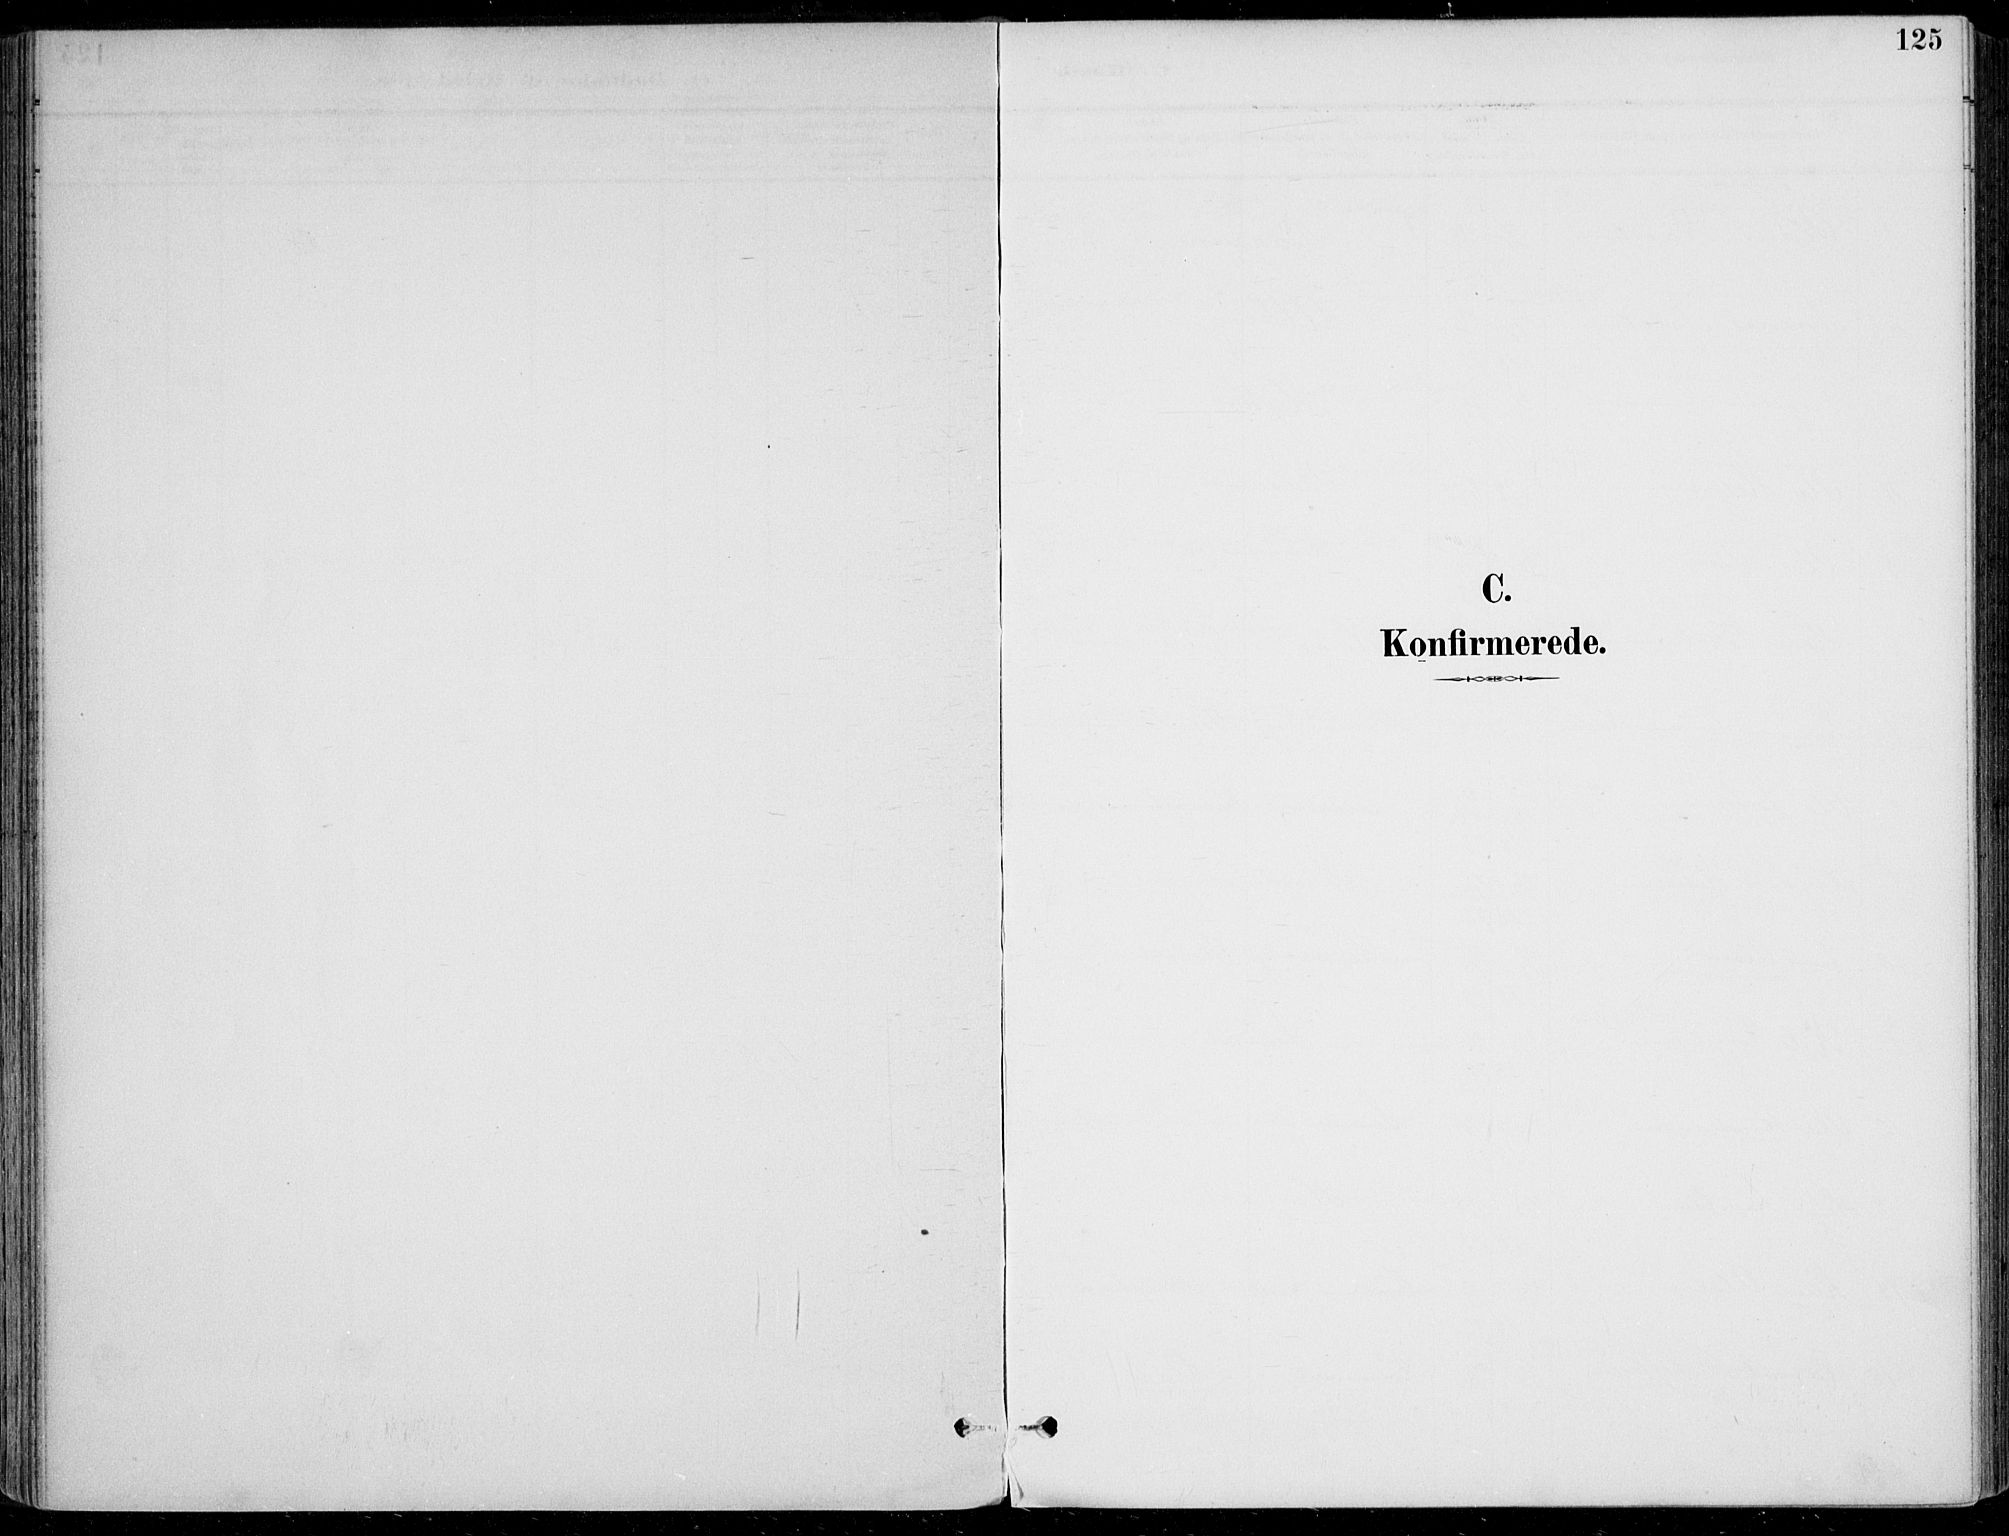 SAKO, Sigdal kirkebøker, F/Fb/L0001: Ministerialbok nr. II 1, 1888-1900, s. 125